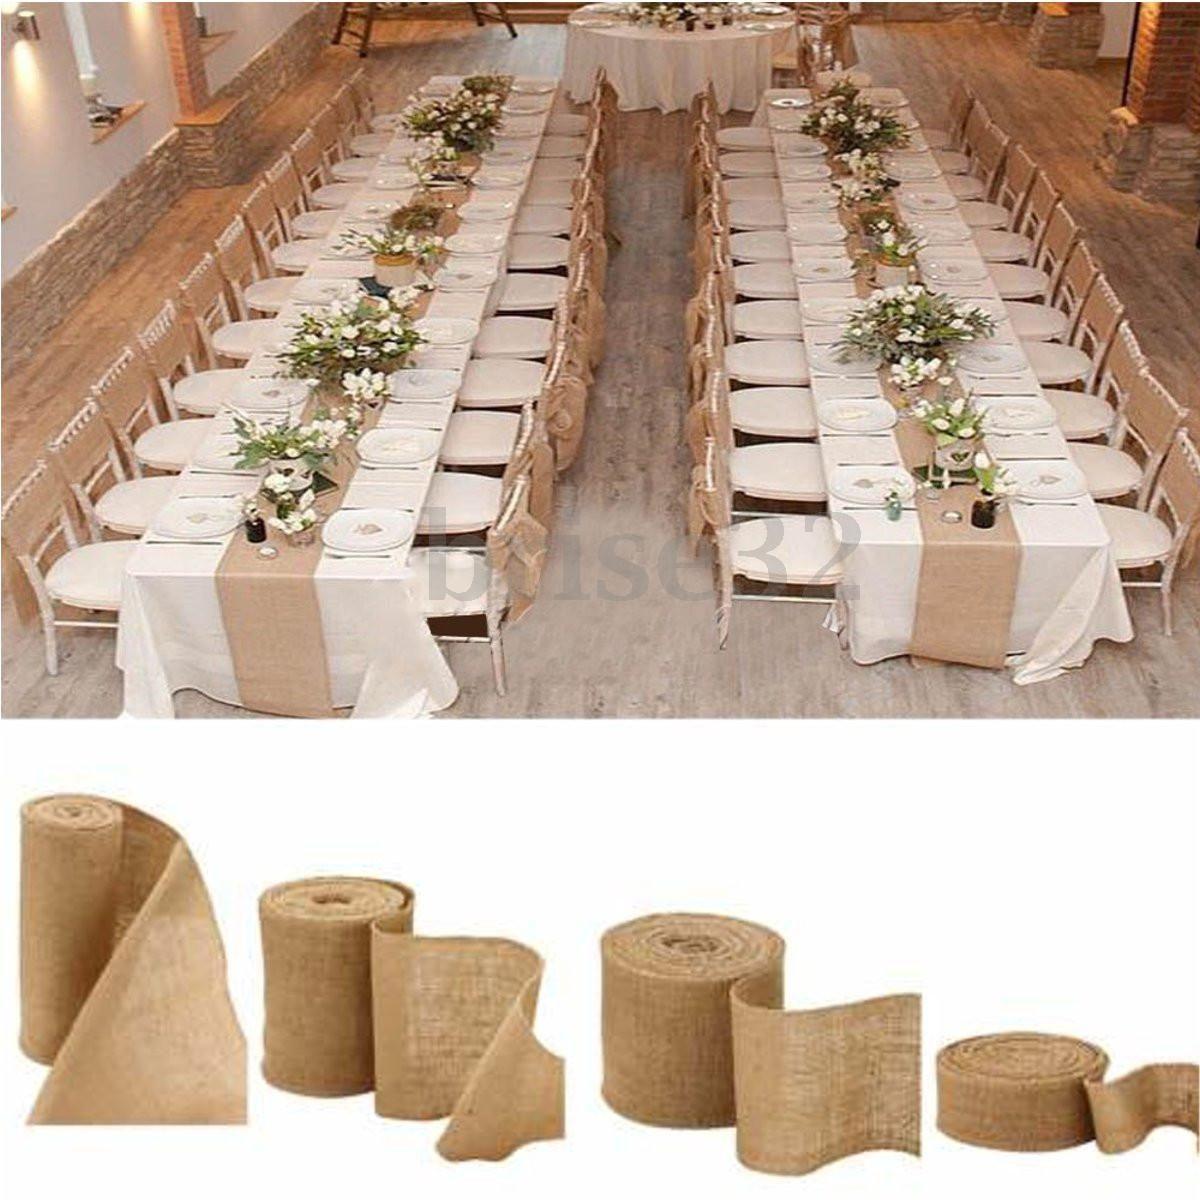 Rustic Wedding Decoration Ideas For Reception: 10M Vintage Table Runner Jute Burlap Hessian Ribbon